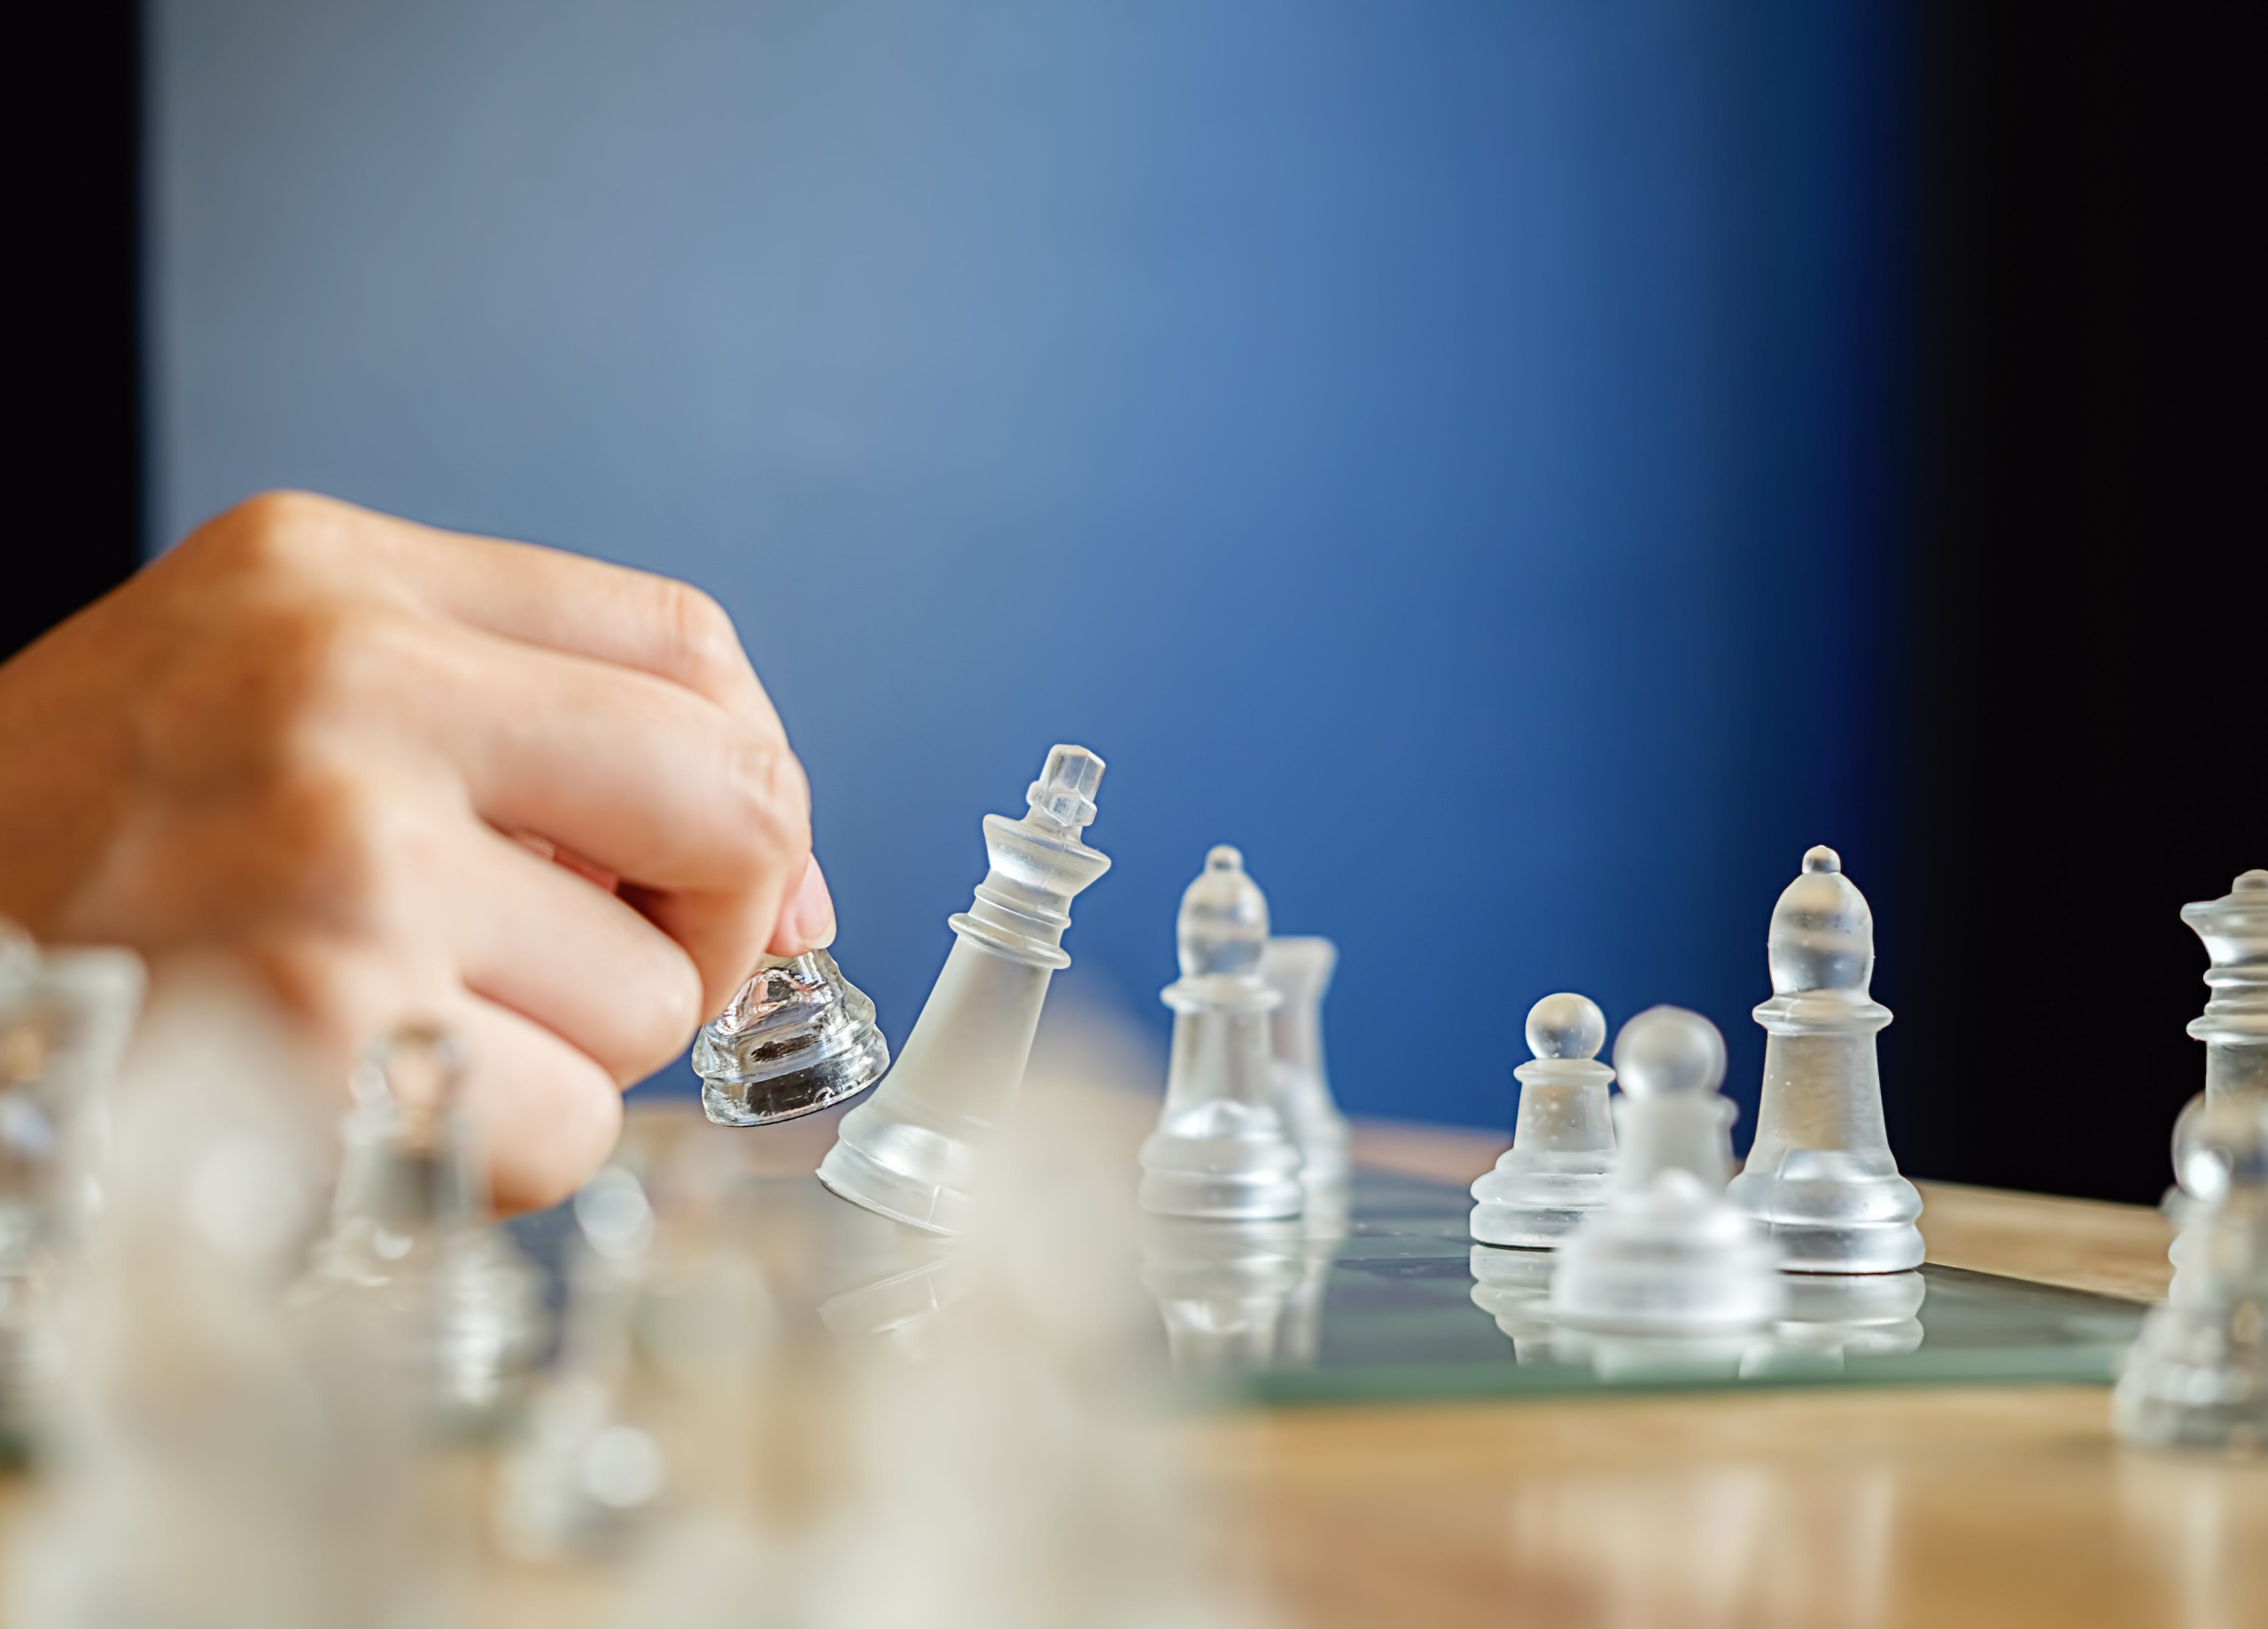 Crisis Response and Competitive Advantage 10-8-21